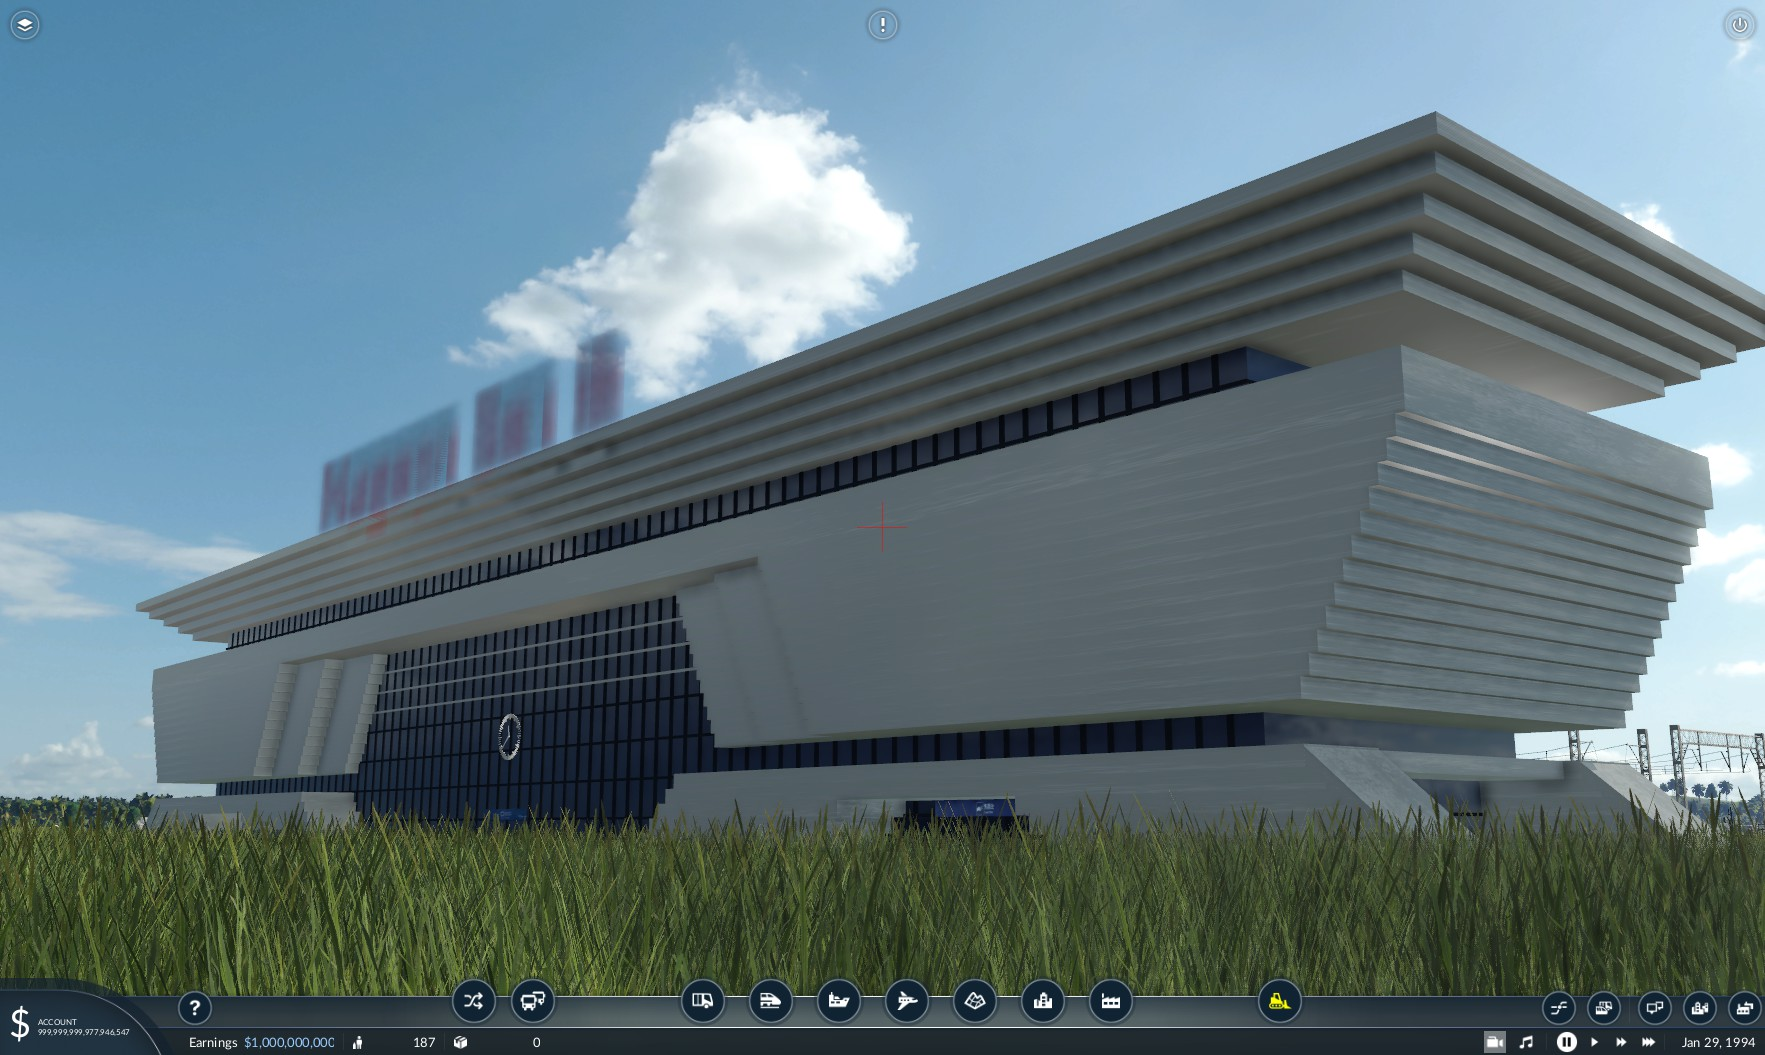 Transport Fever 2 - ReS+No.2 Station Building & Overhead Hall